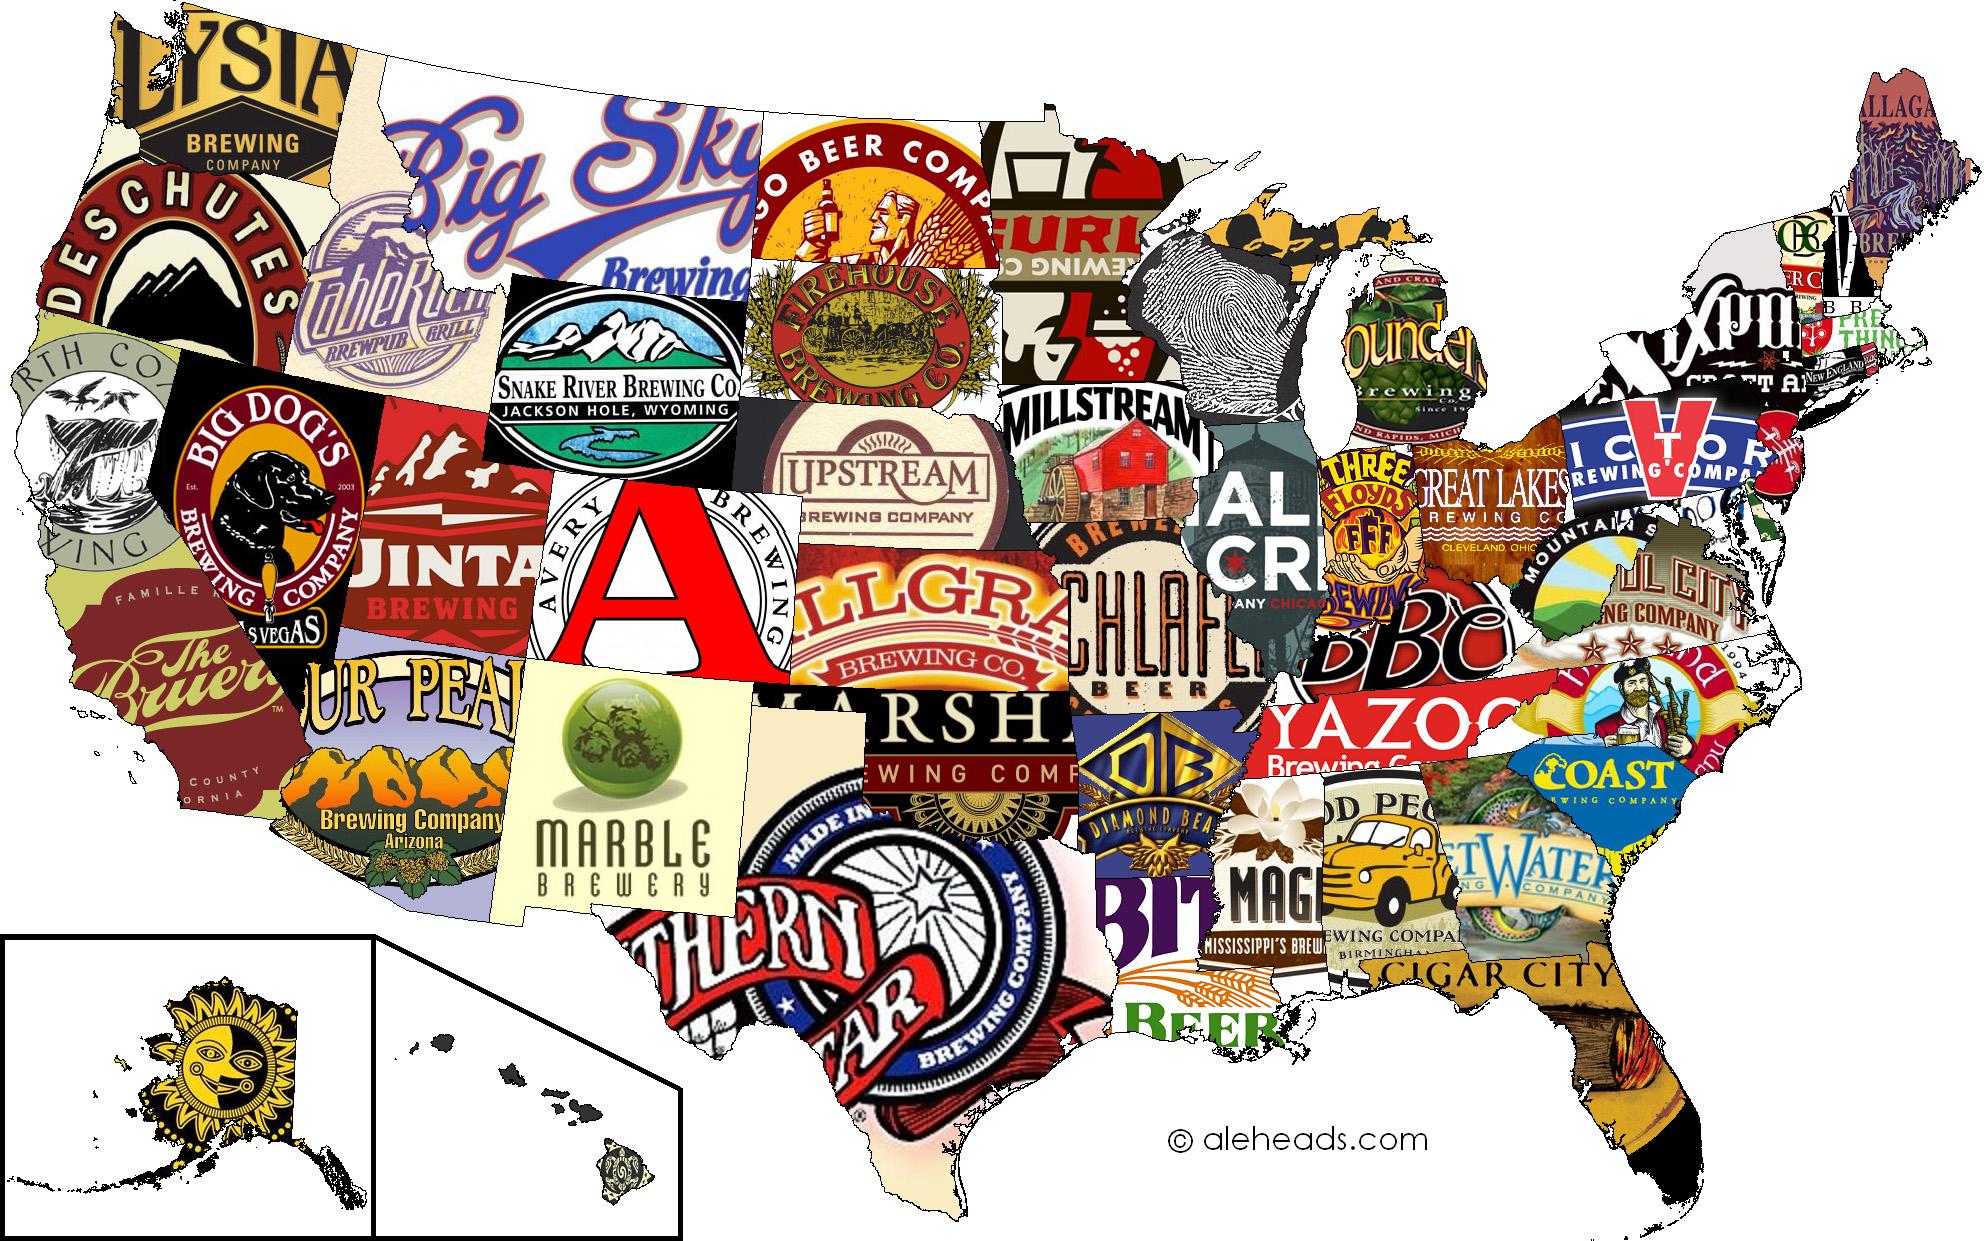 Craft Beer Industry Reports